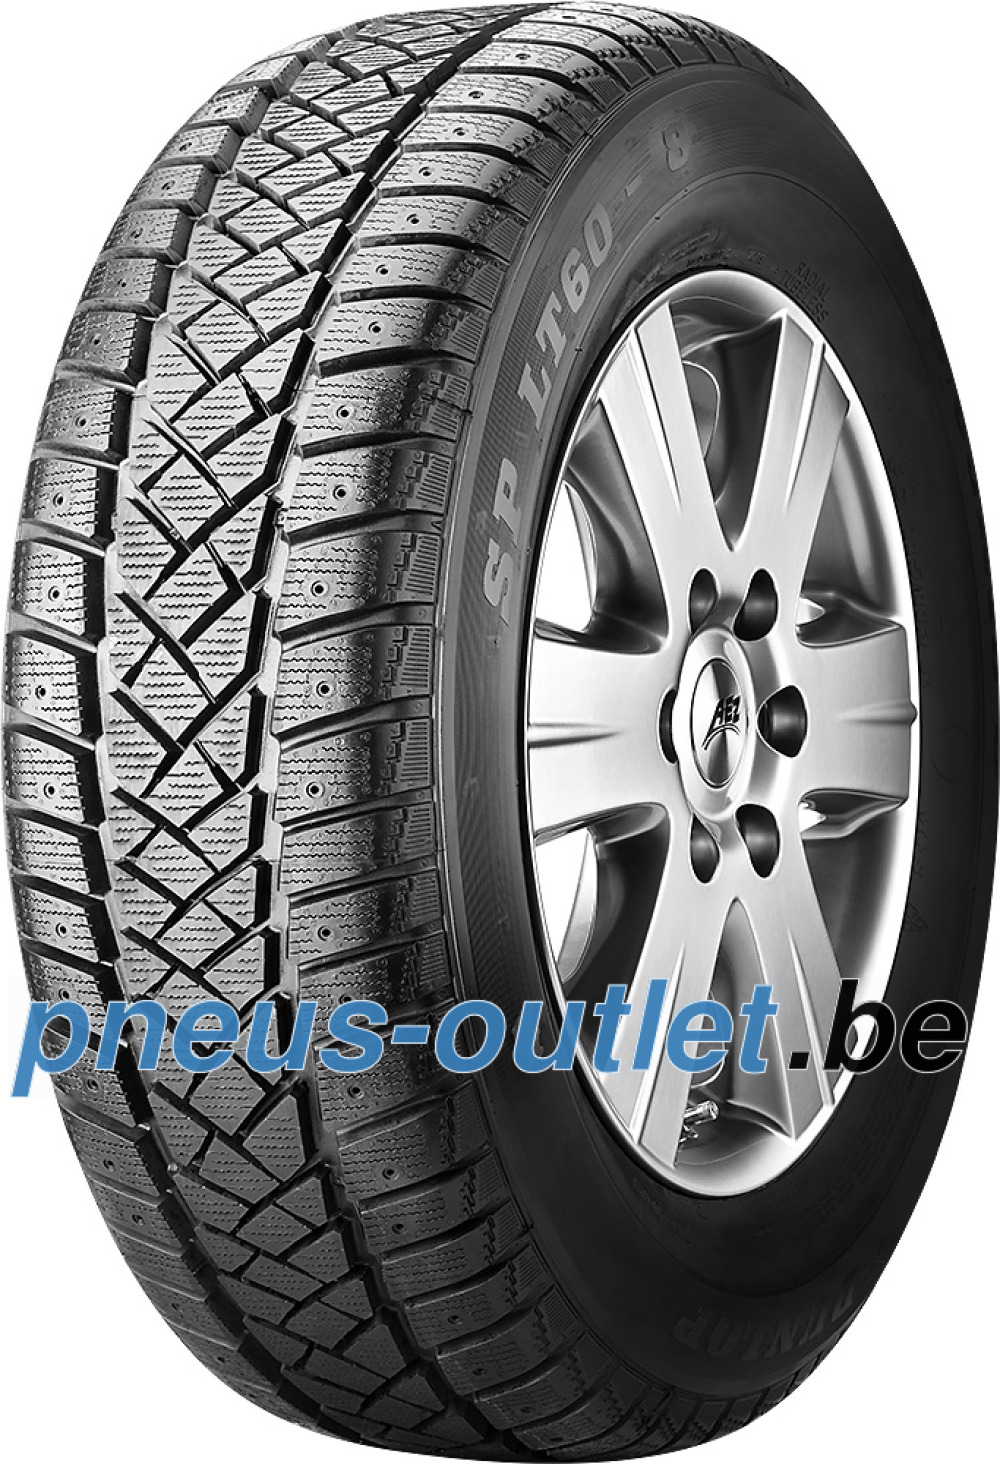 Dunlop SP LT 60 ( 225/65 R16C 112/110R 8PR )